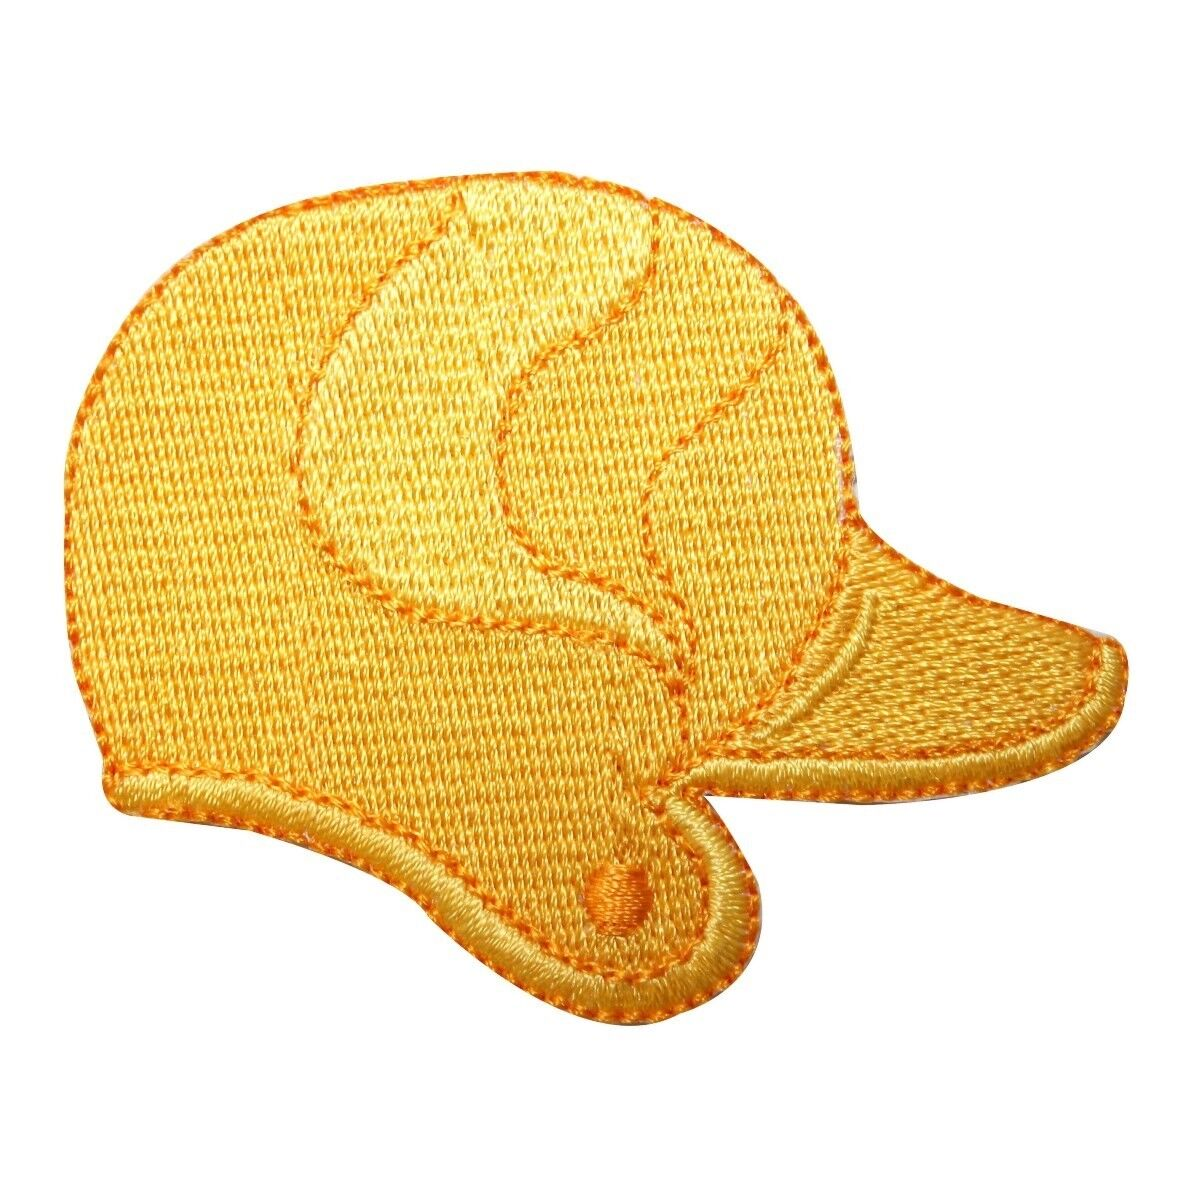 ID 1589B Batting Helmet Patch Baseball Softball Bat Embroide